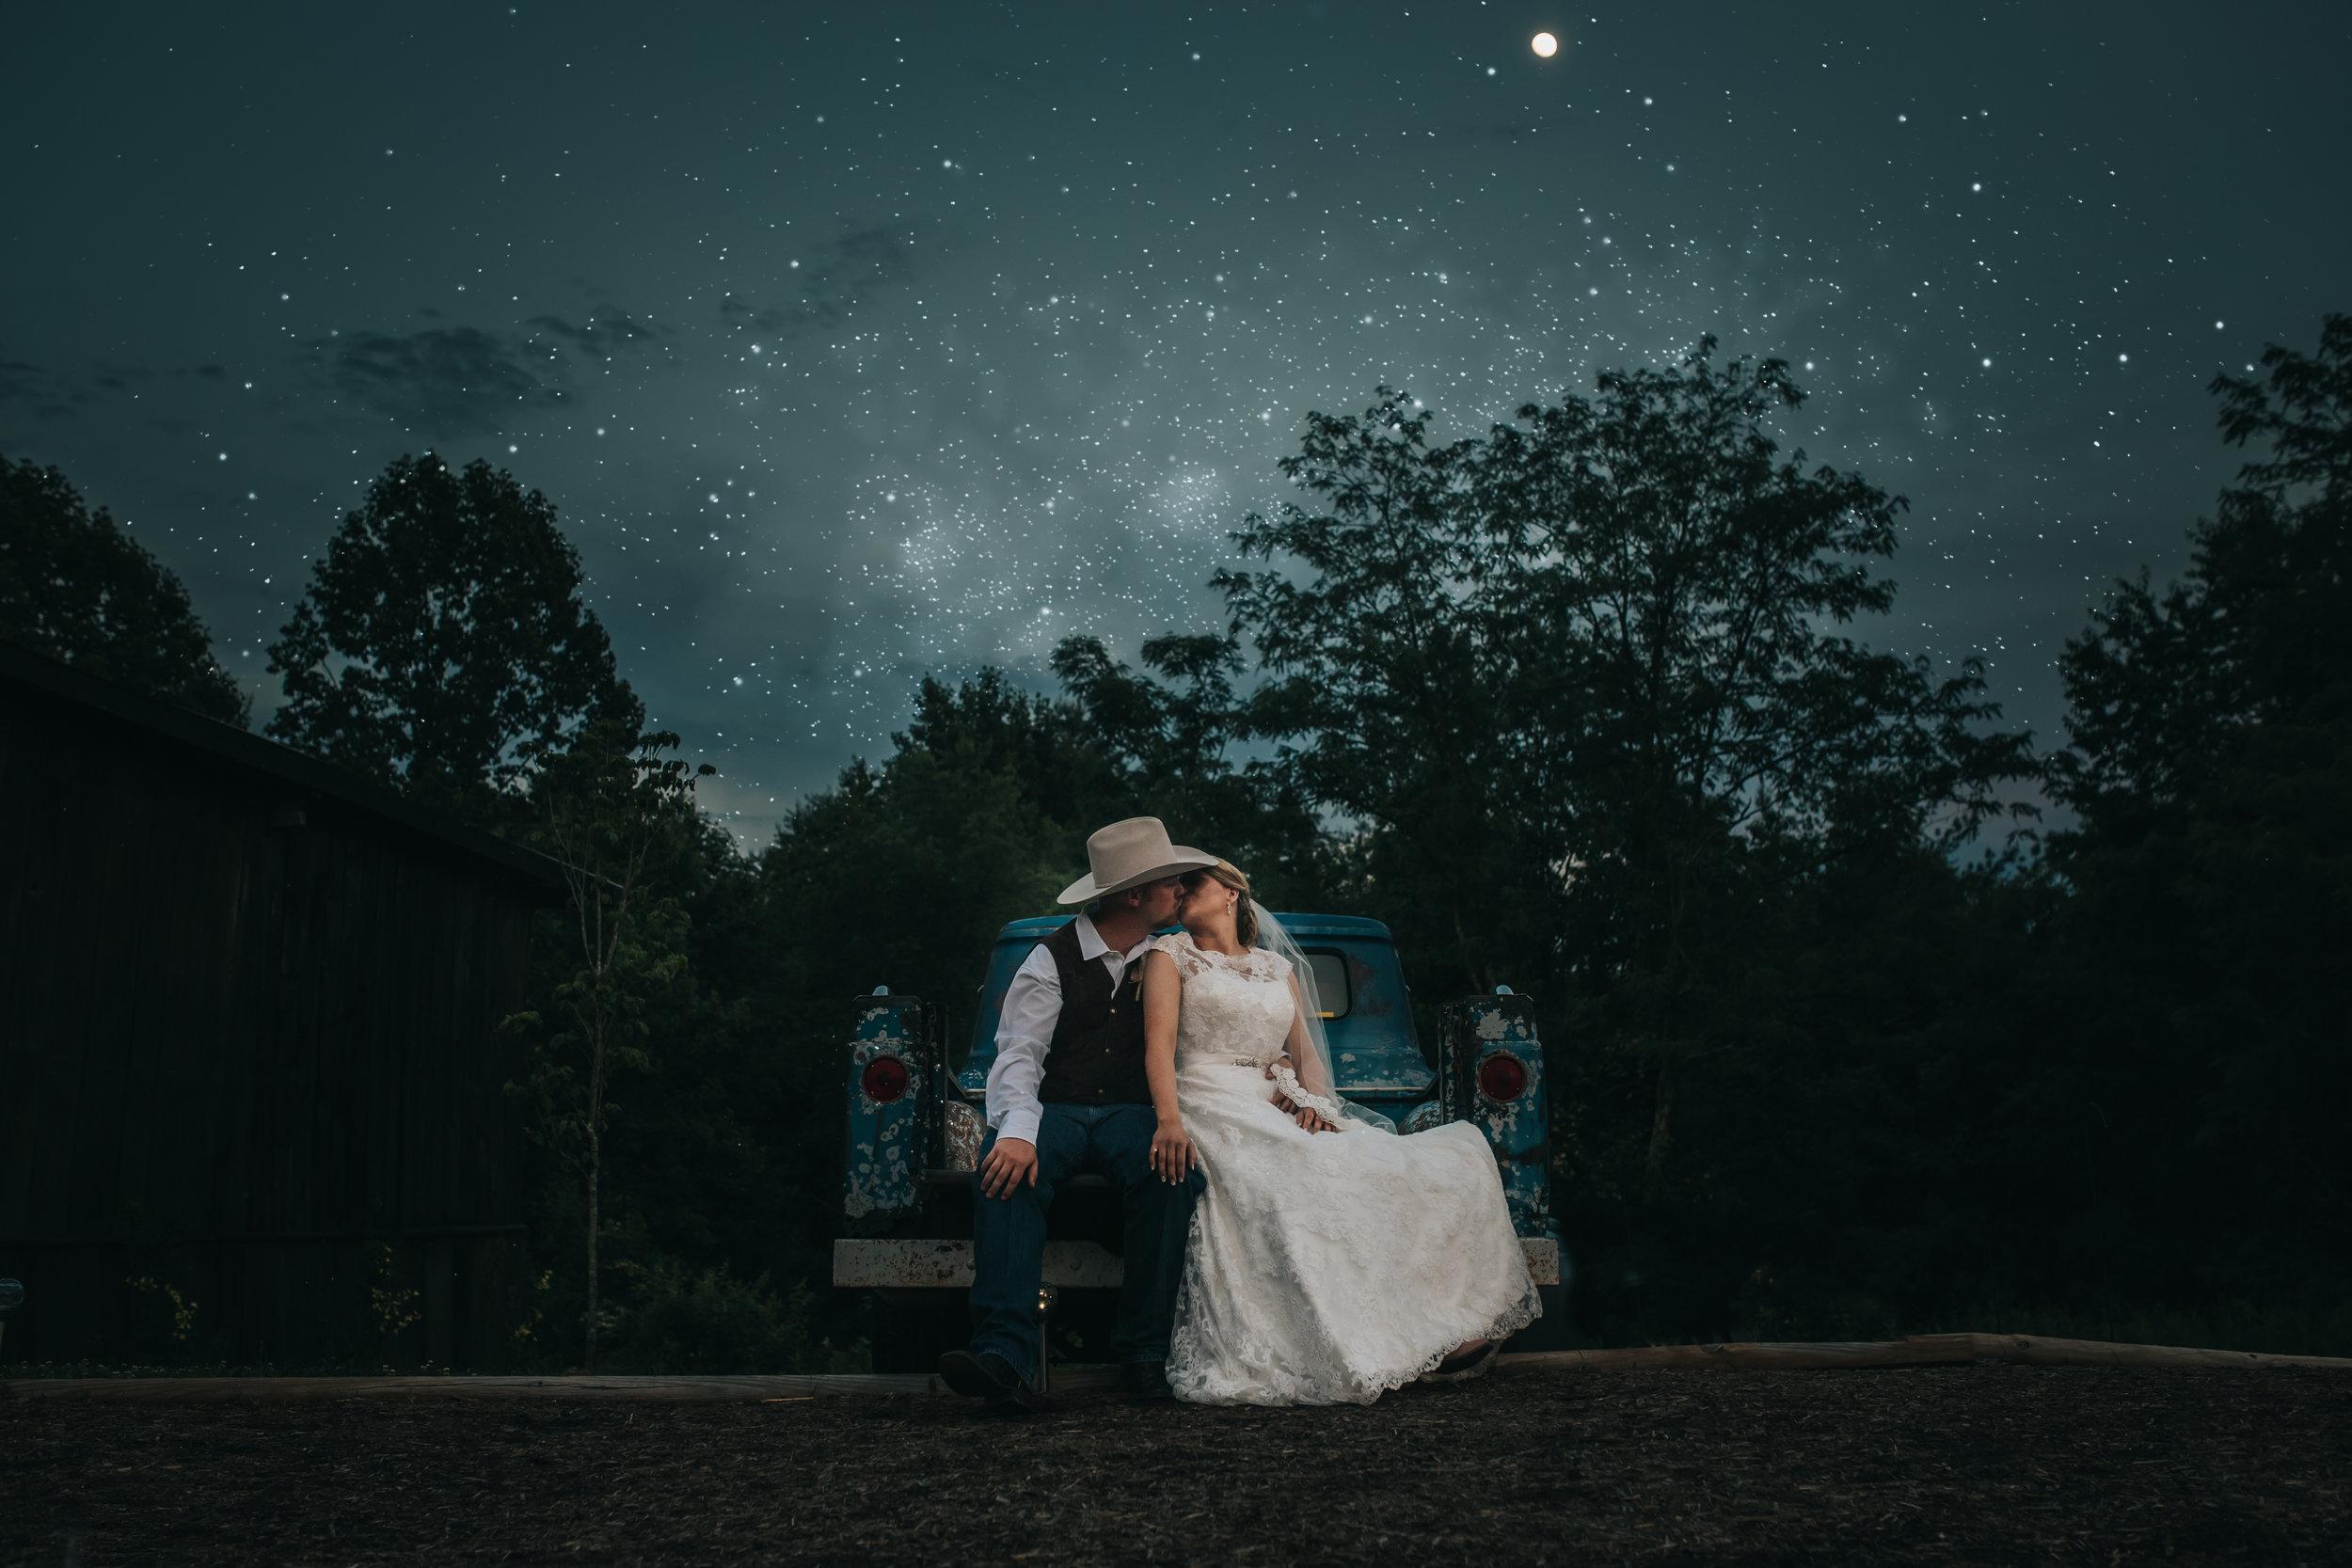 1085 Ariana Jordan Photo - Dahkota & Emily's Wedding 8532.jpg